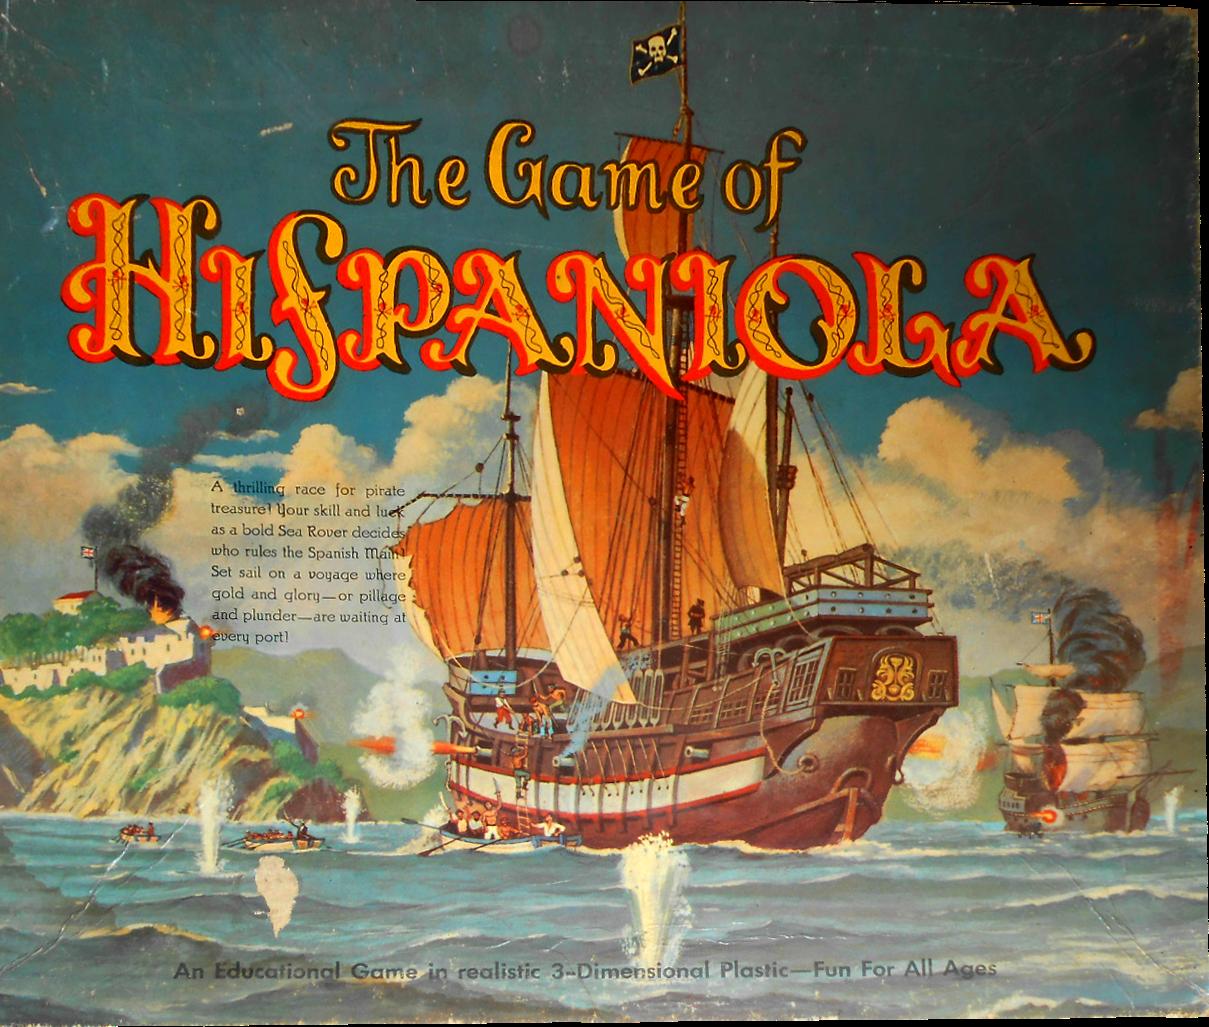 Hispaniola Pirates gold, Spanish galleon, Educational games